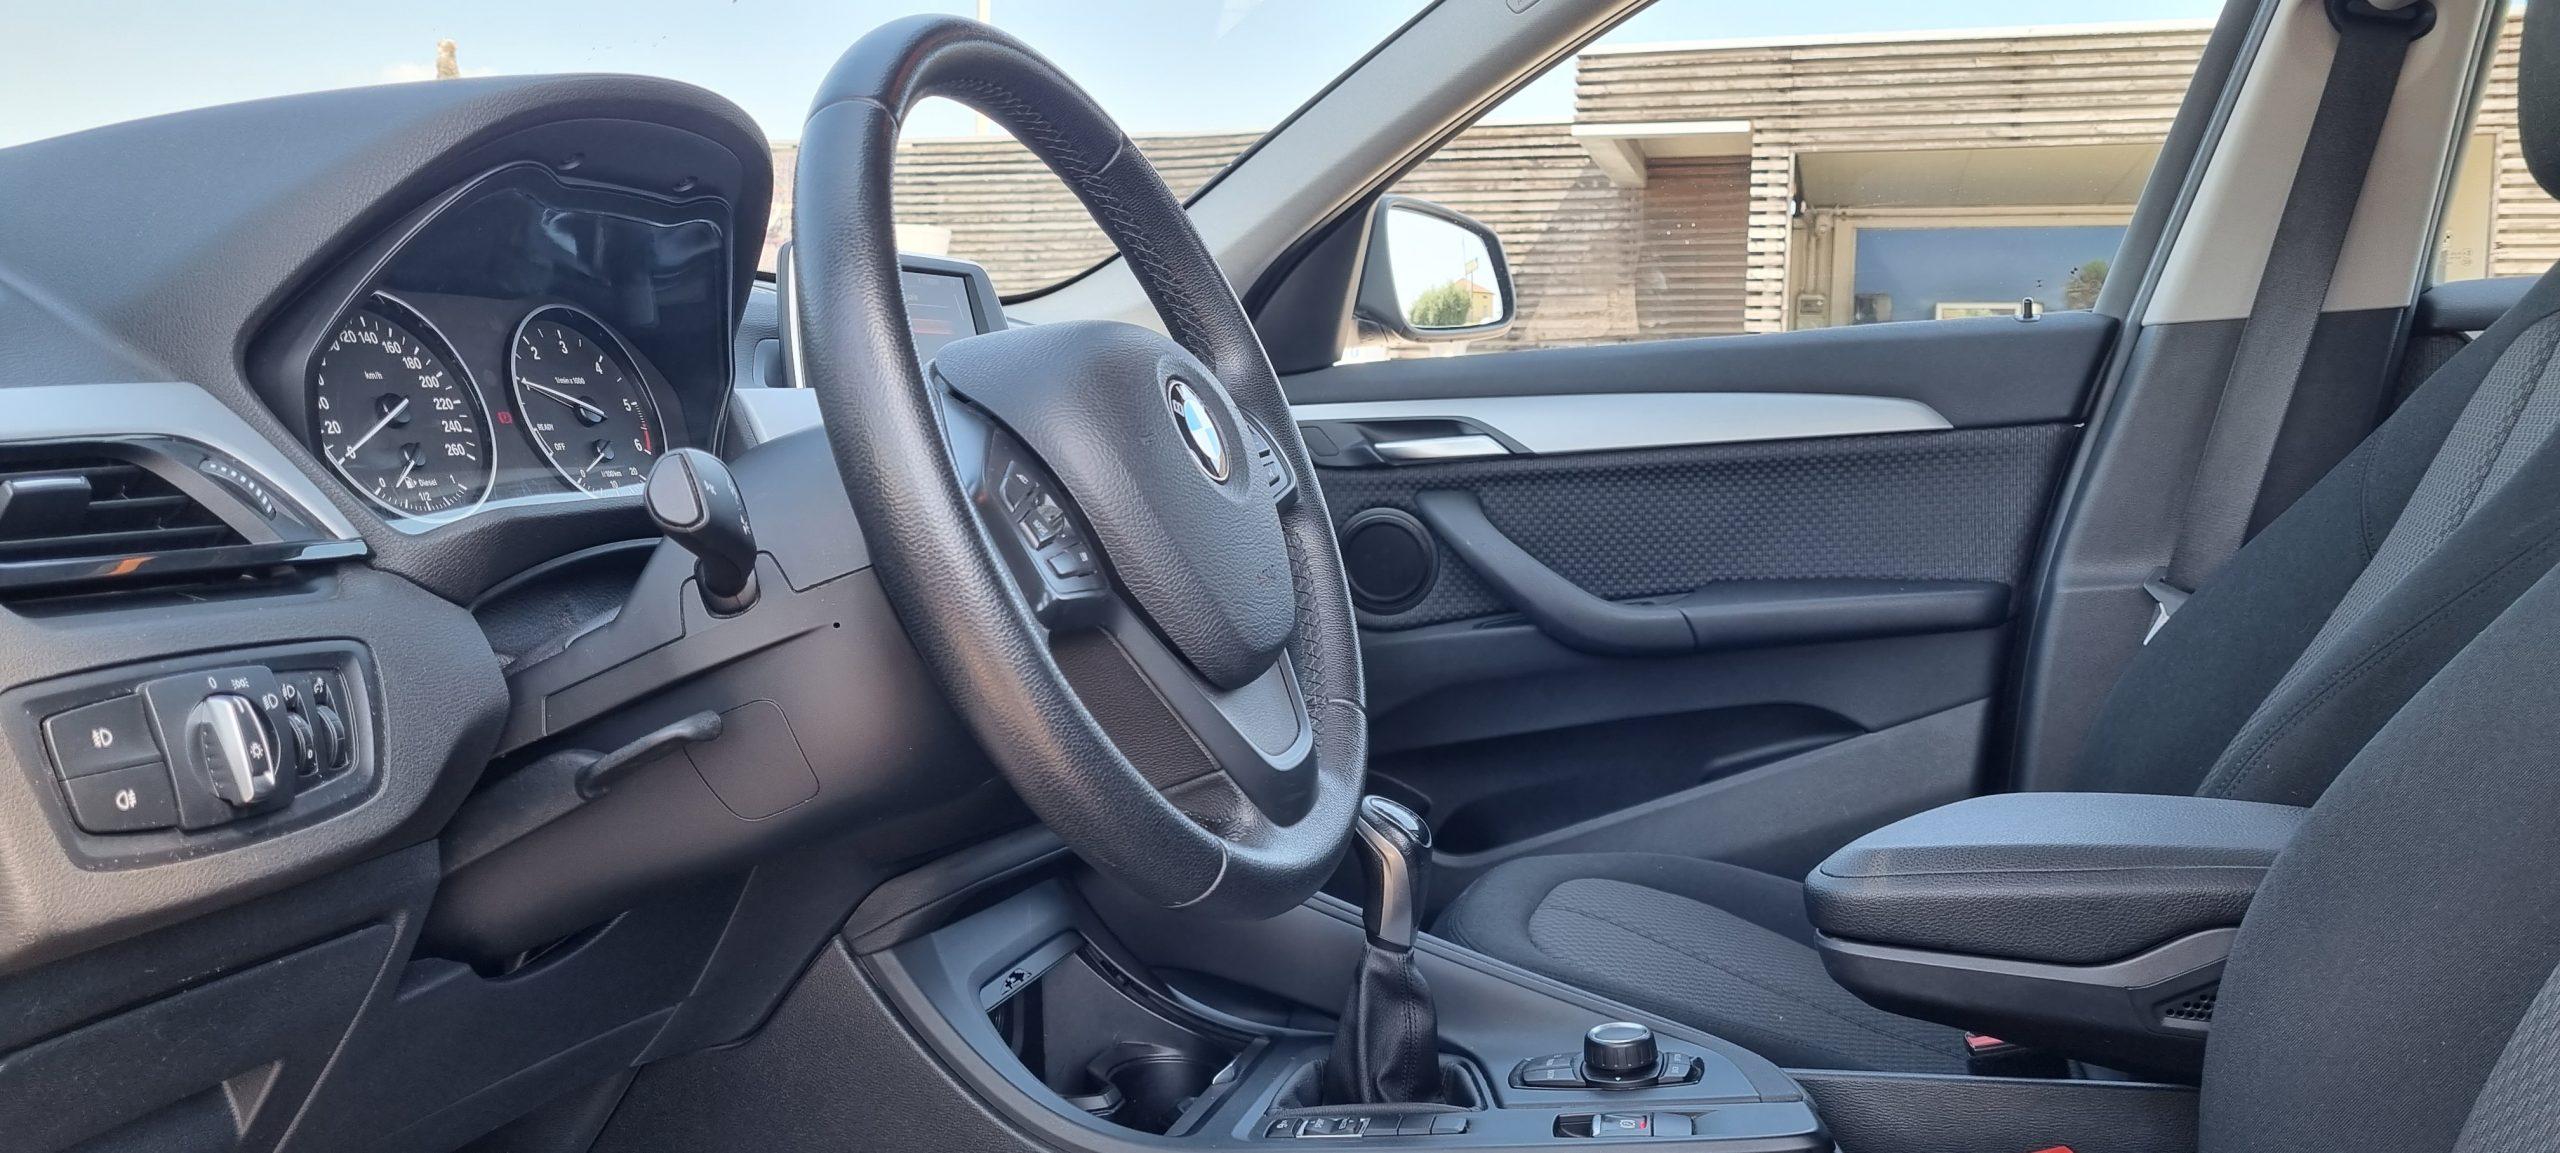 BMW X1 SDRIVE 1.6 D